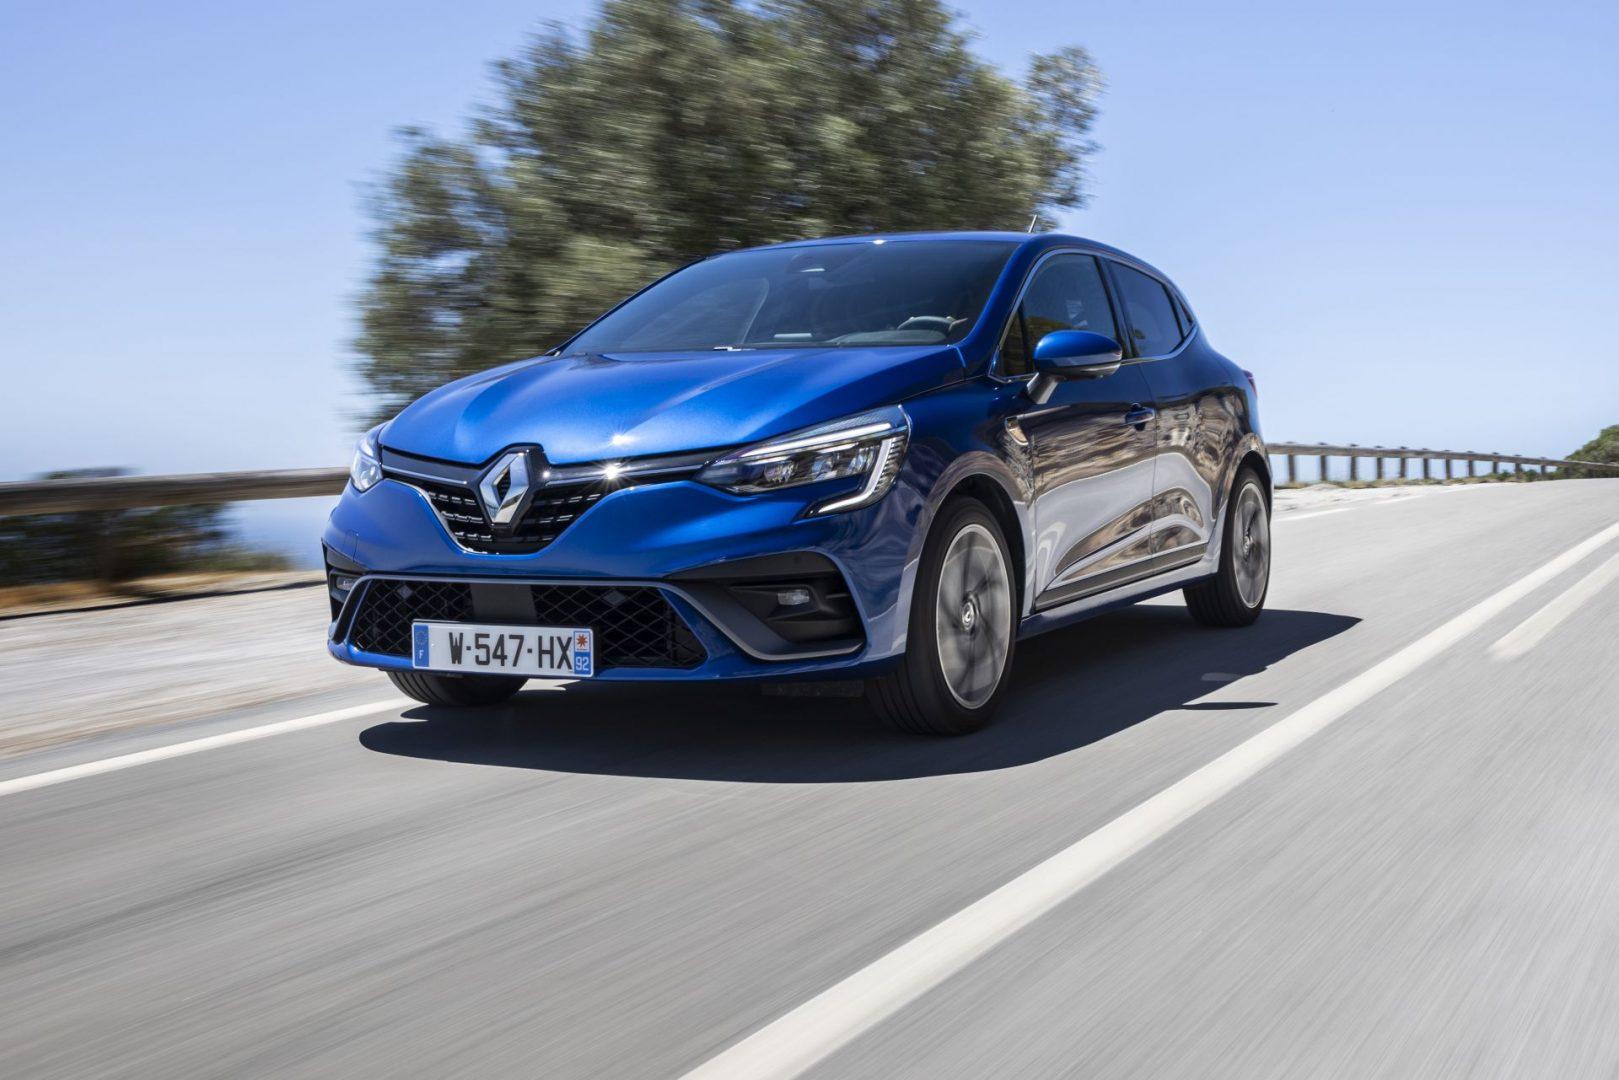 Stigao je Renault Clio Tce 100 LPG s pogonom na plin